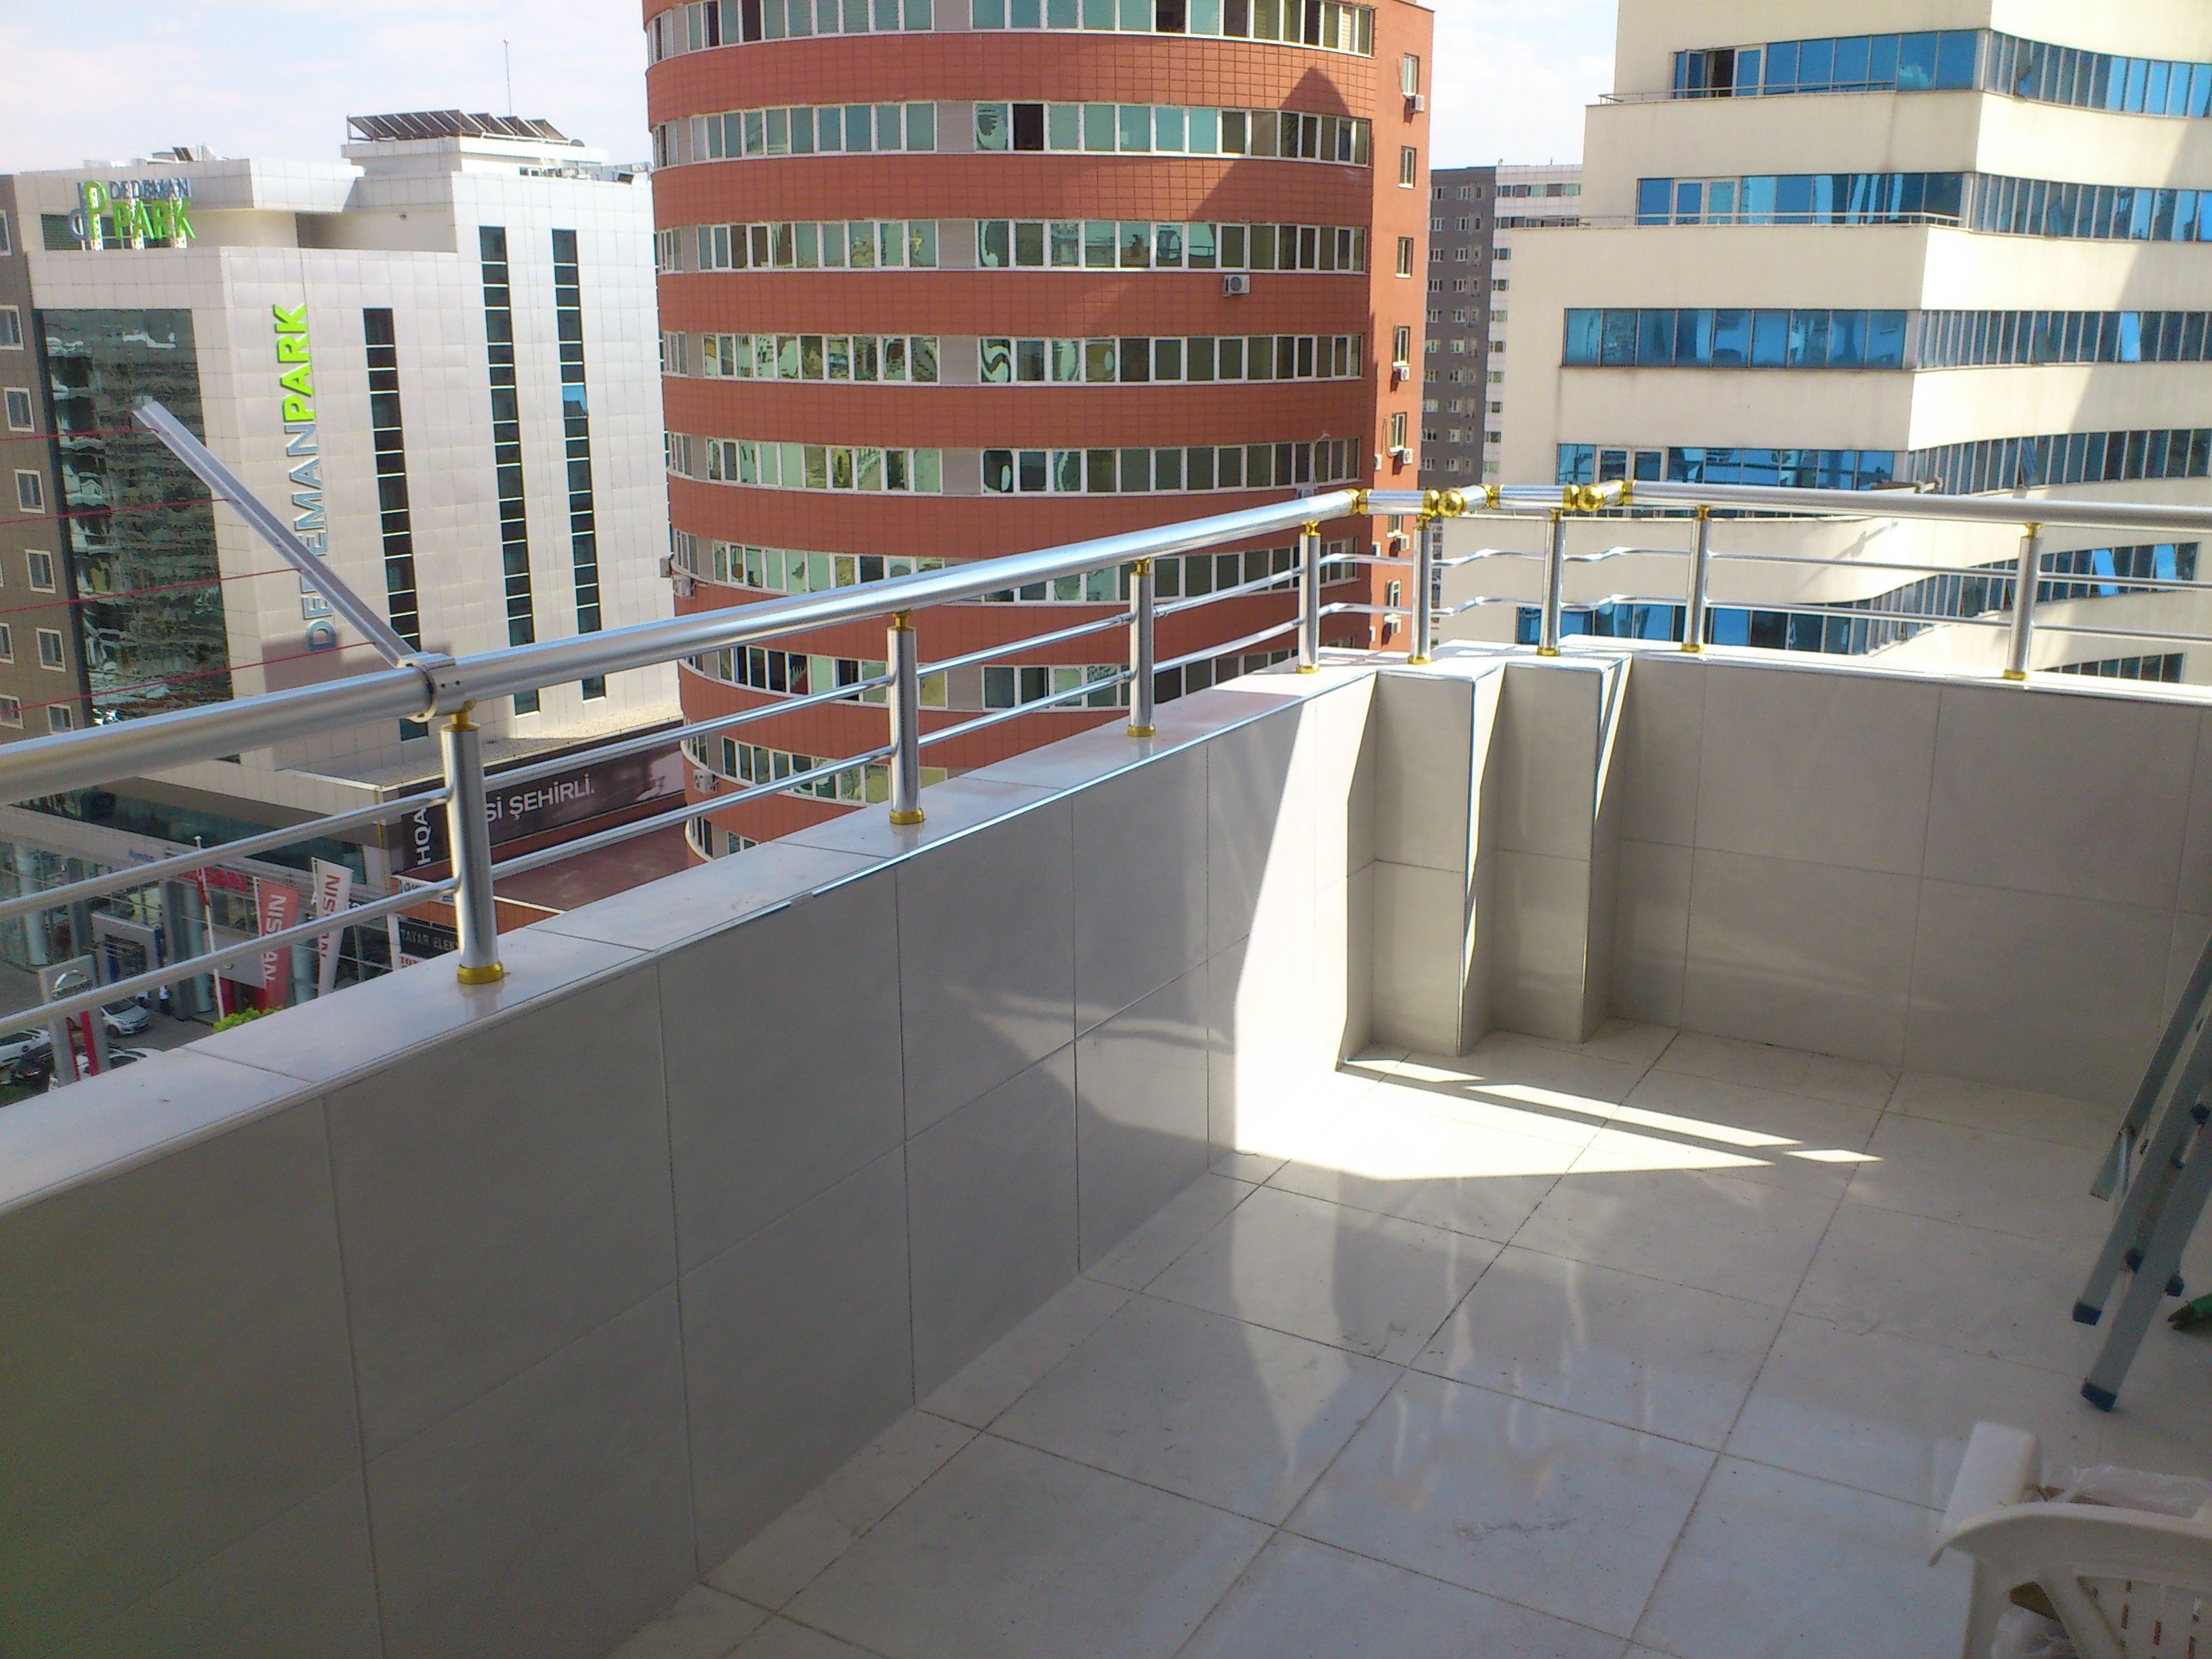 İki emniyet şeritli balkon korkuluğu www.dekoinoxpaslanmaz.com